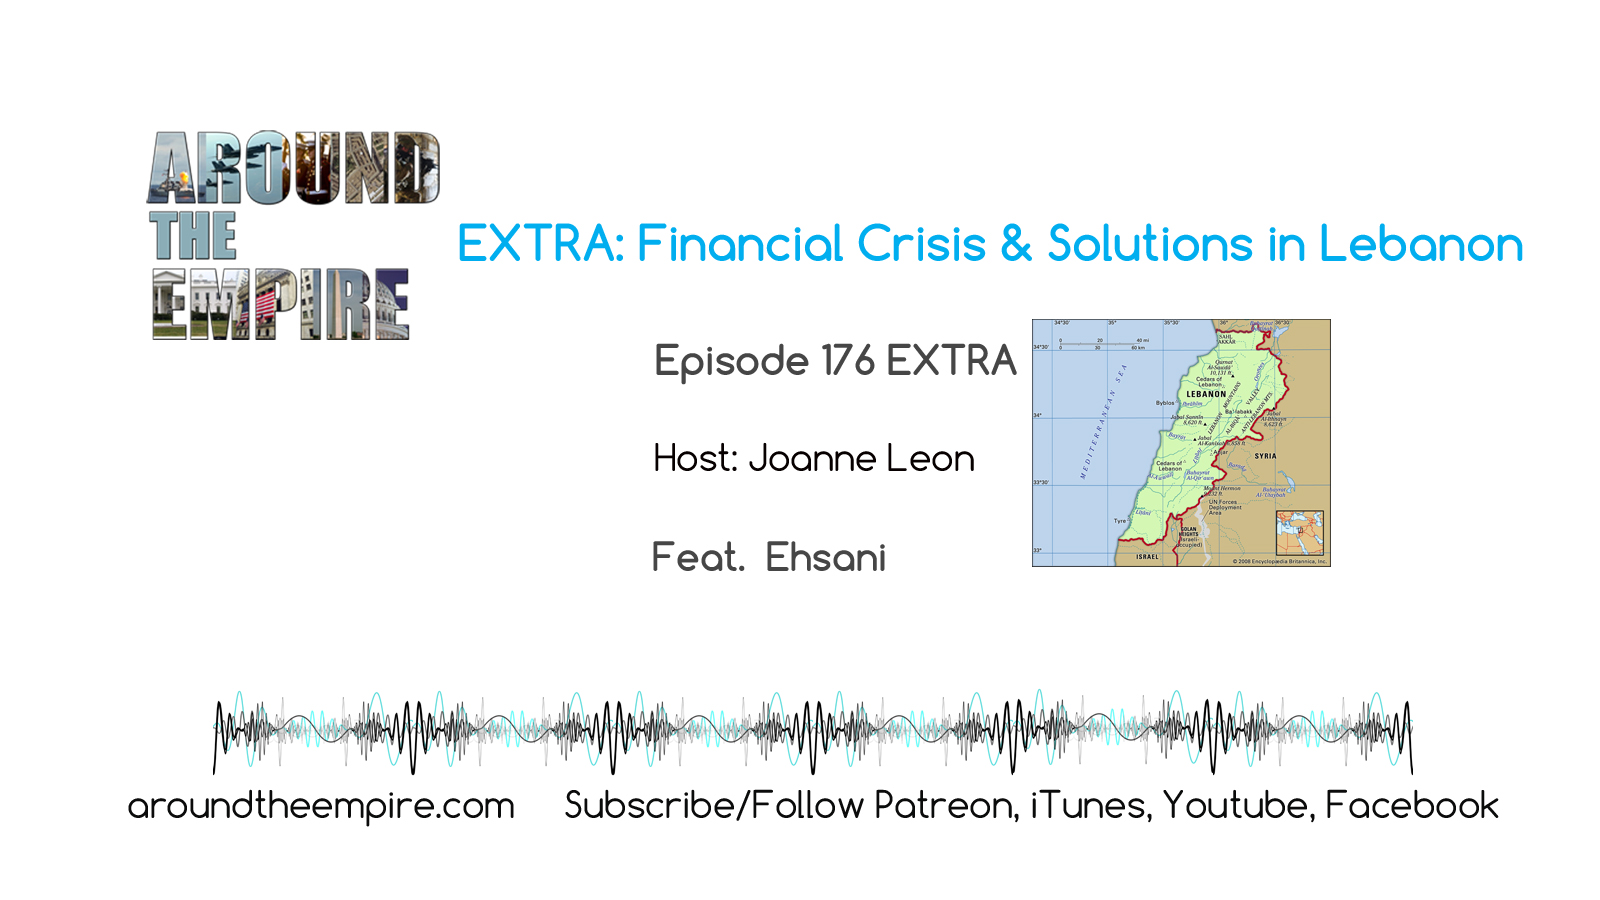 Ep 176 Financial Crisis in Lebanon feat Ehsani